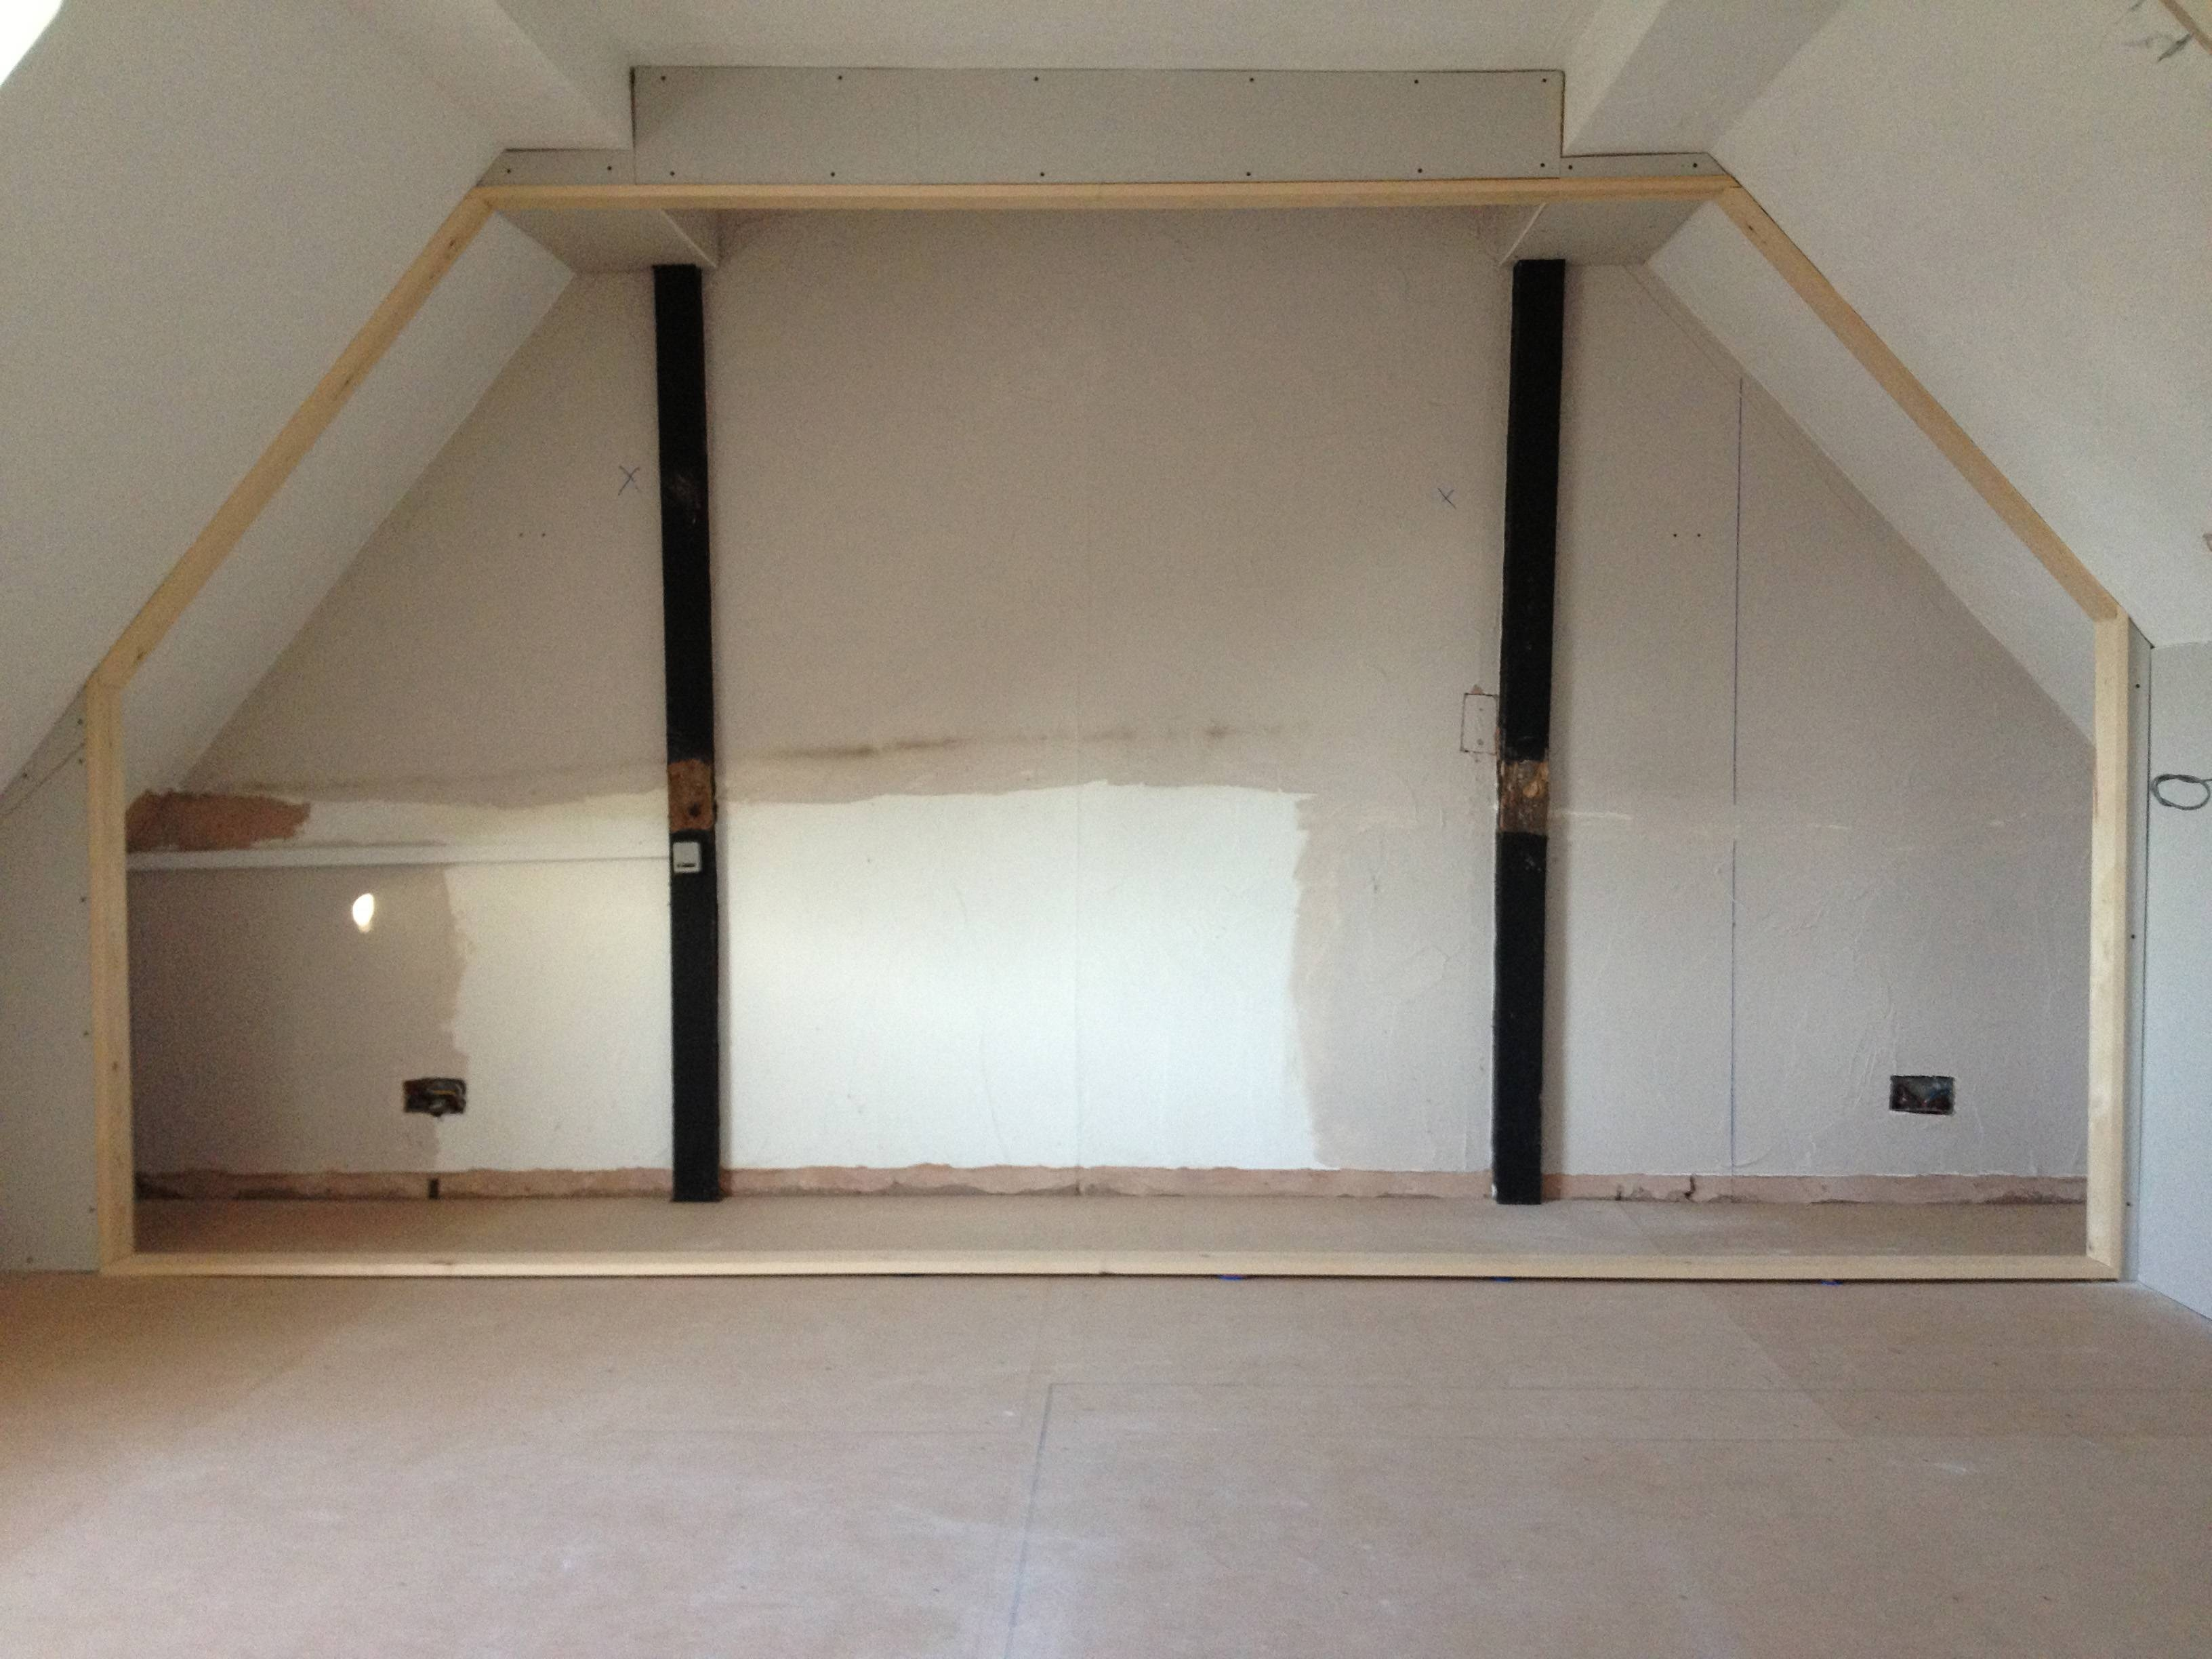 Wardrobes Doors & Sliding Wardrobe Doors Within A Frame regarding Curved Wardrobe Doors (Image 29 of 30)